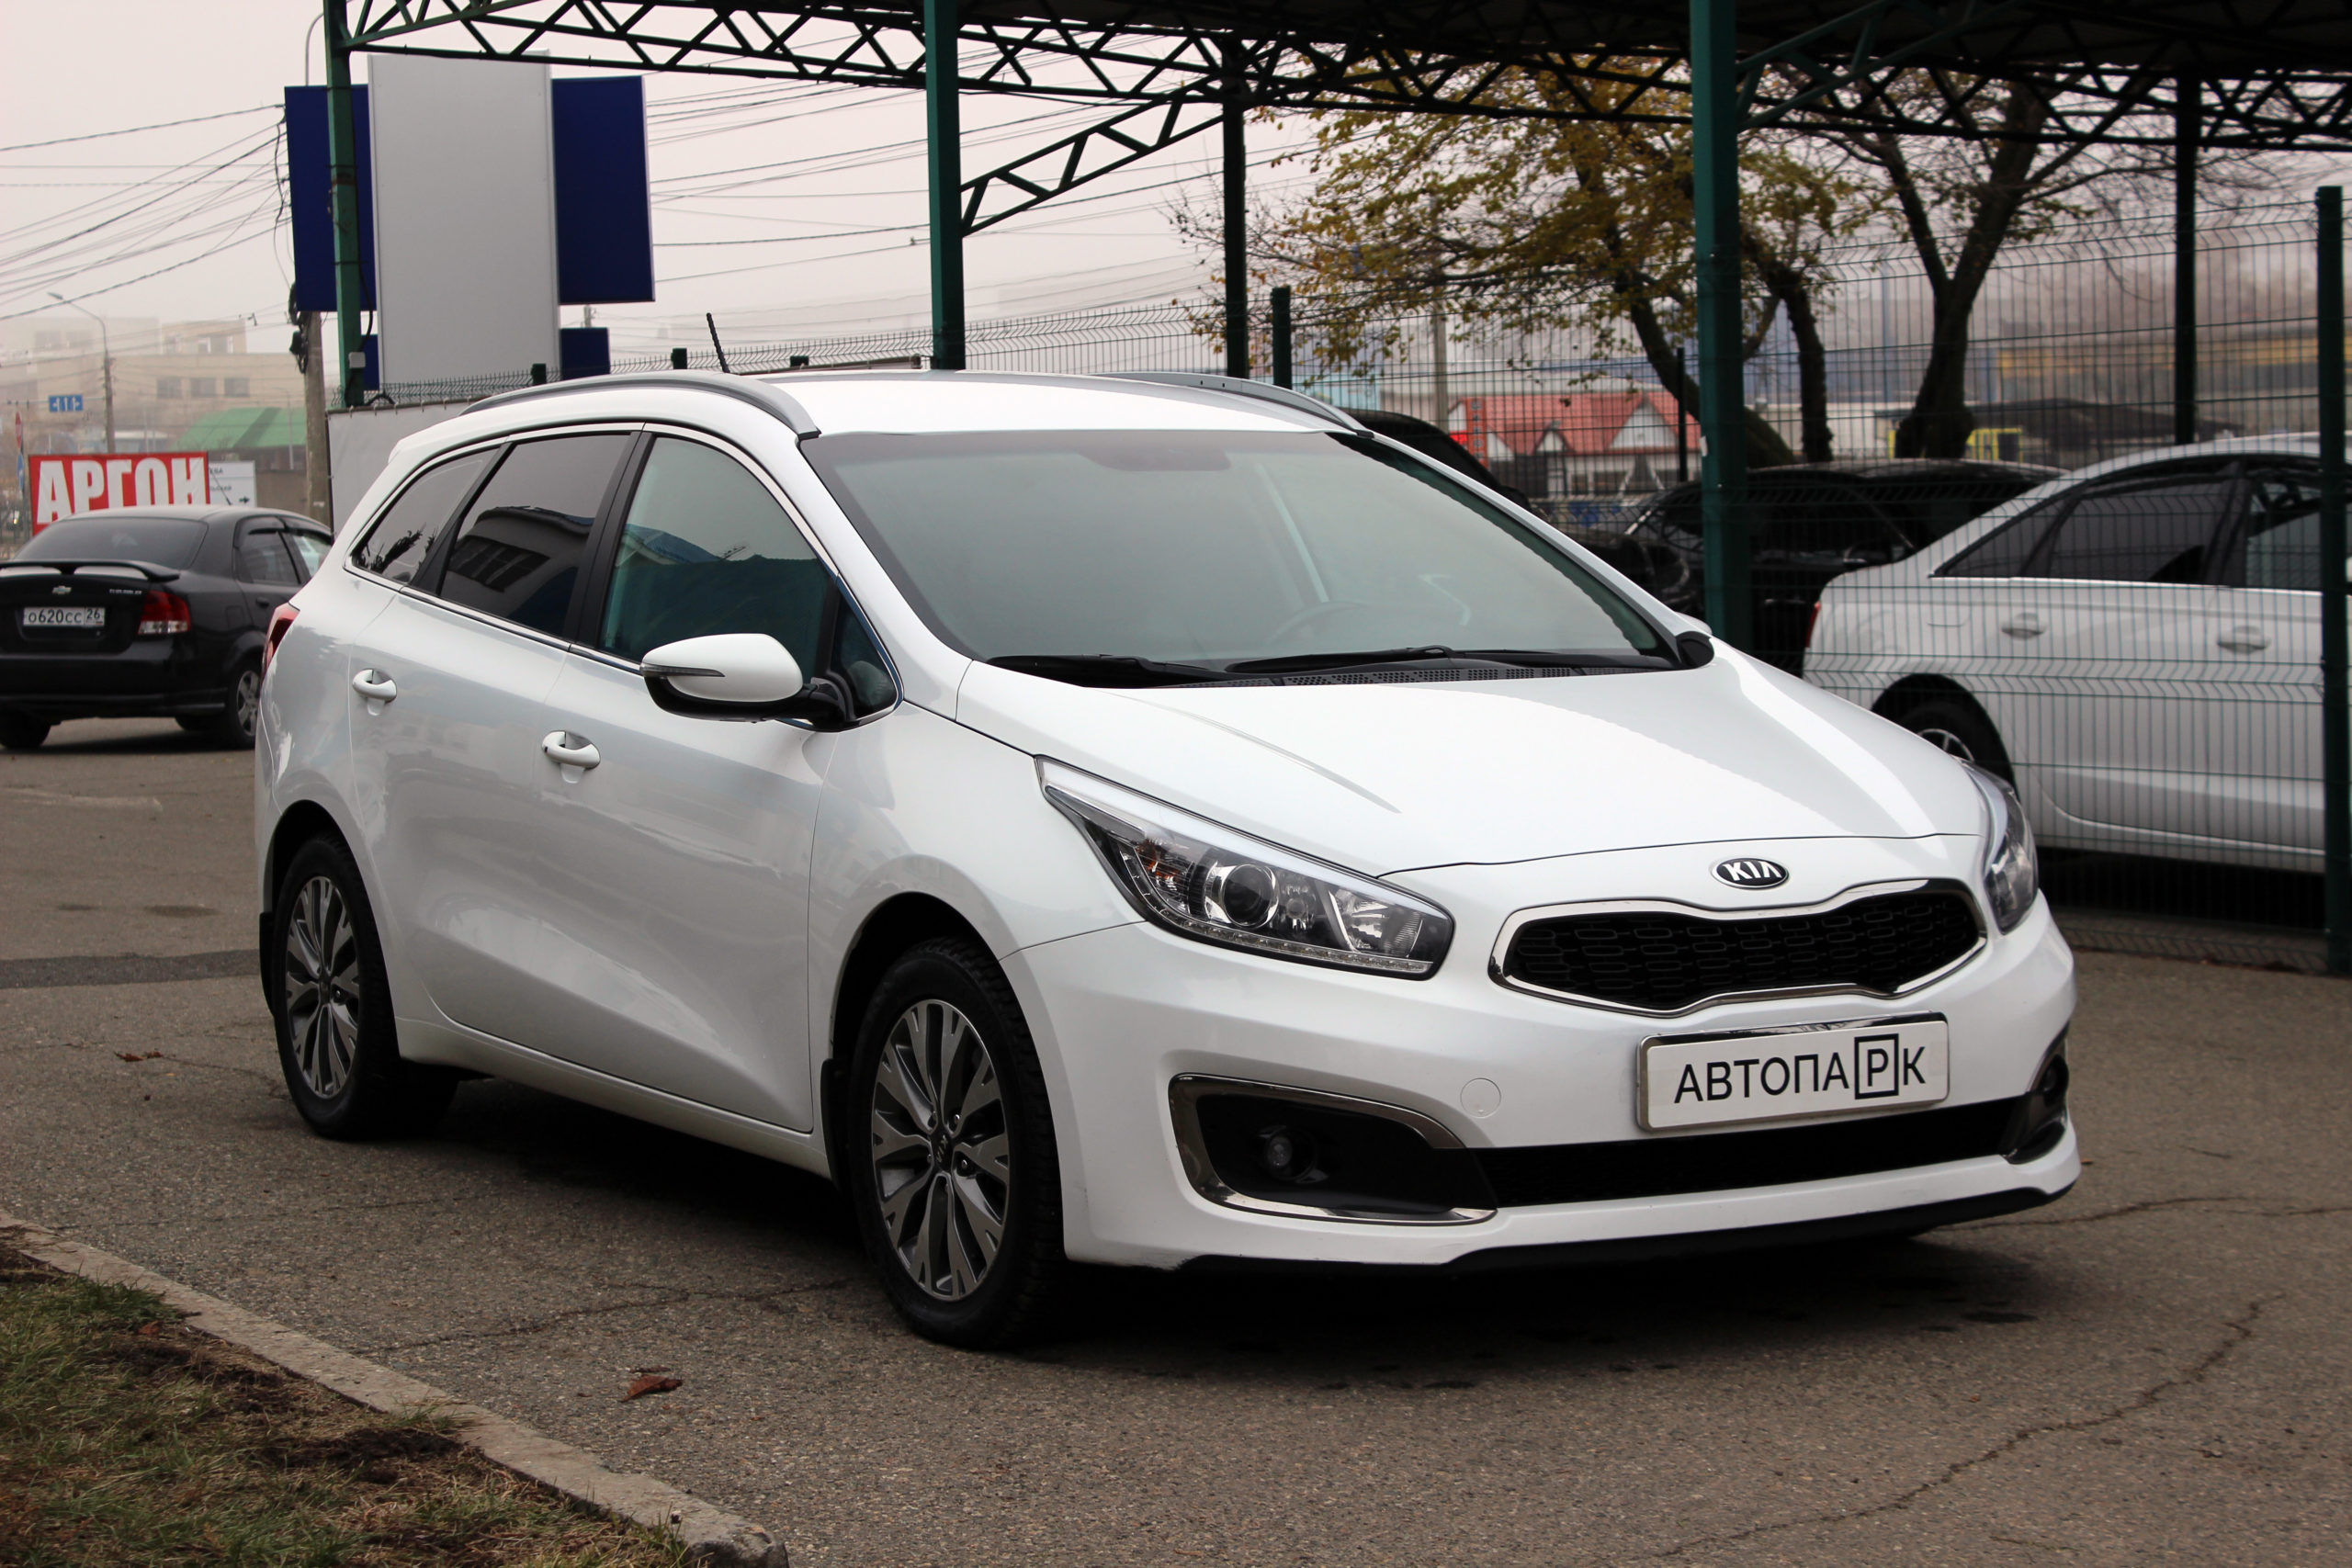 Купить KIA JD (Cee'd) (Белый) - Автопарк Ставрополь